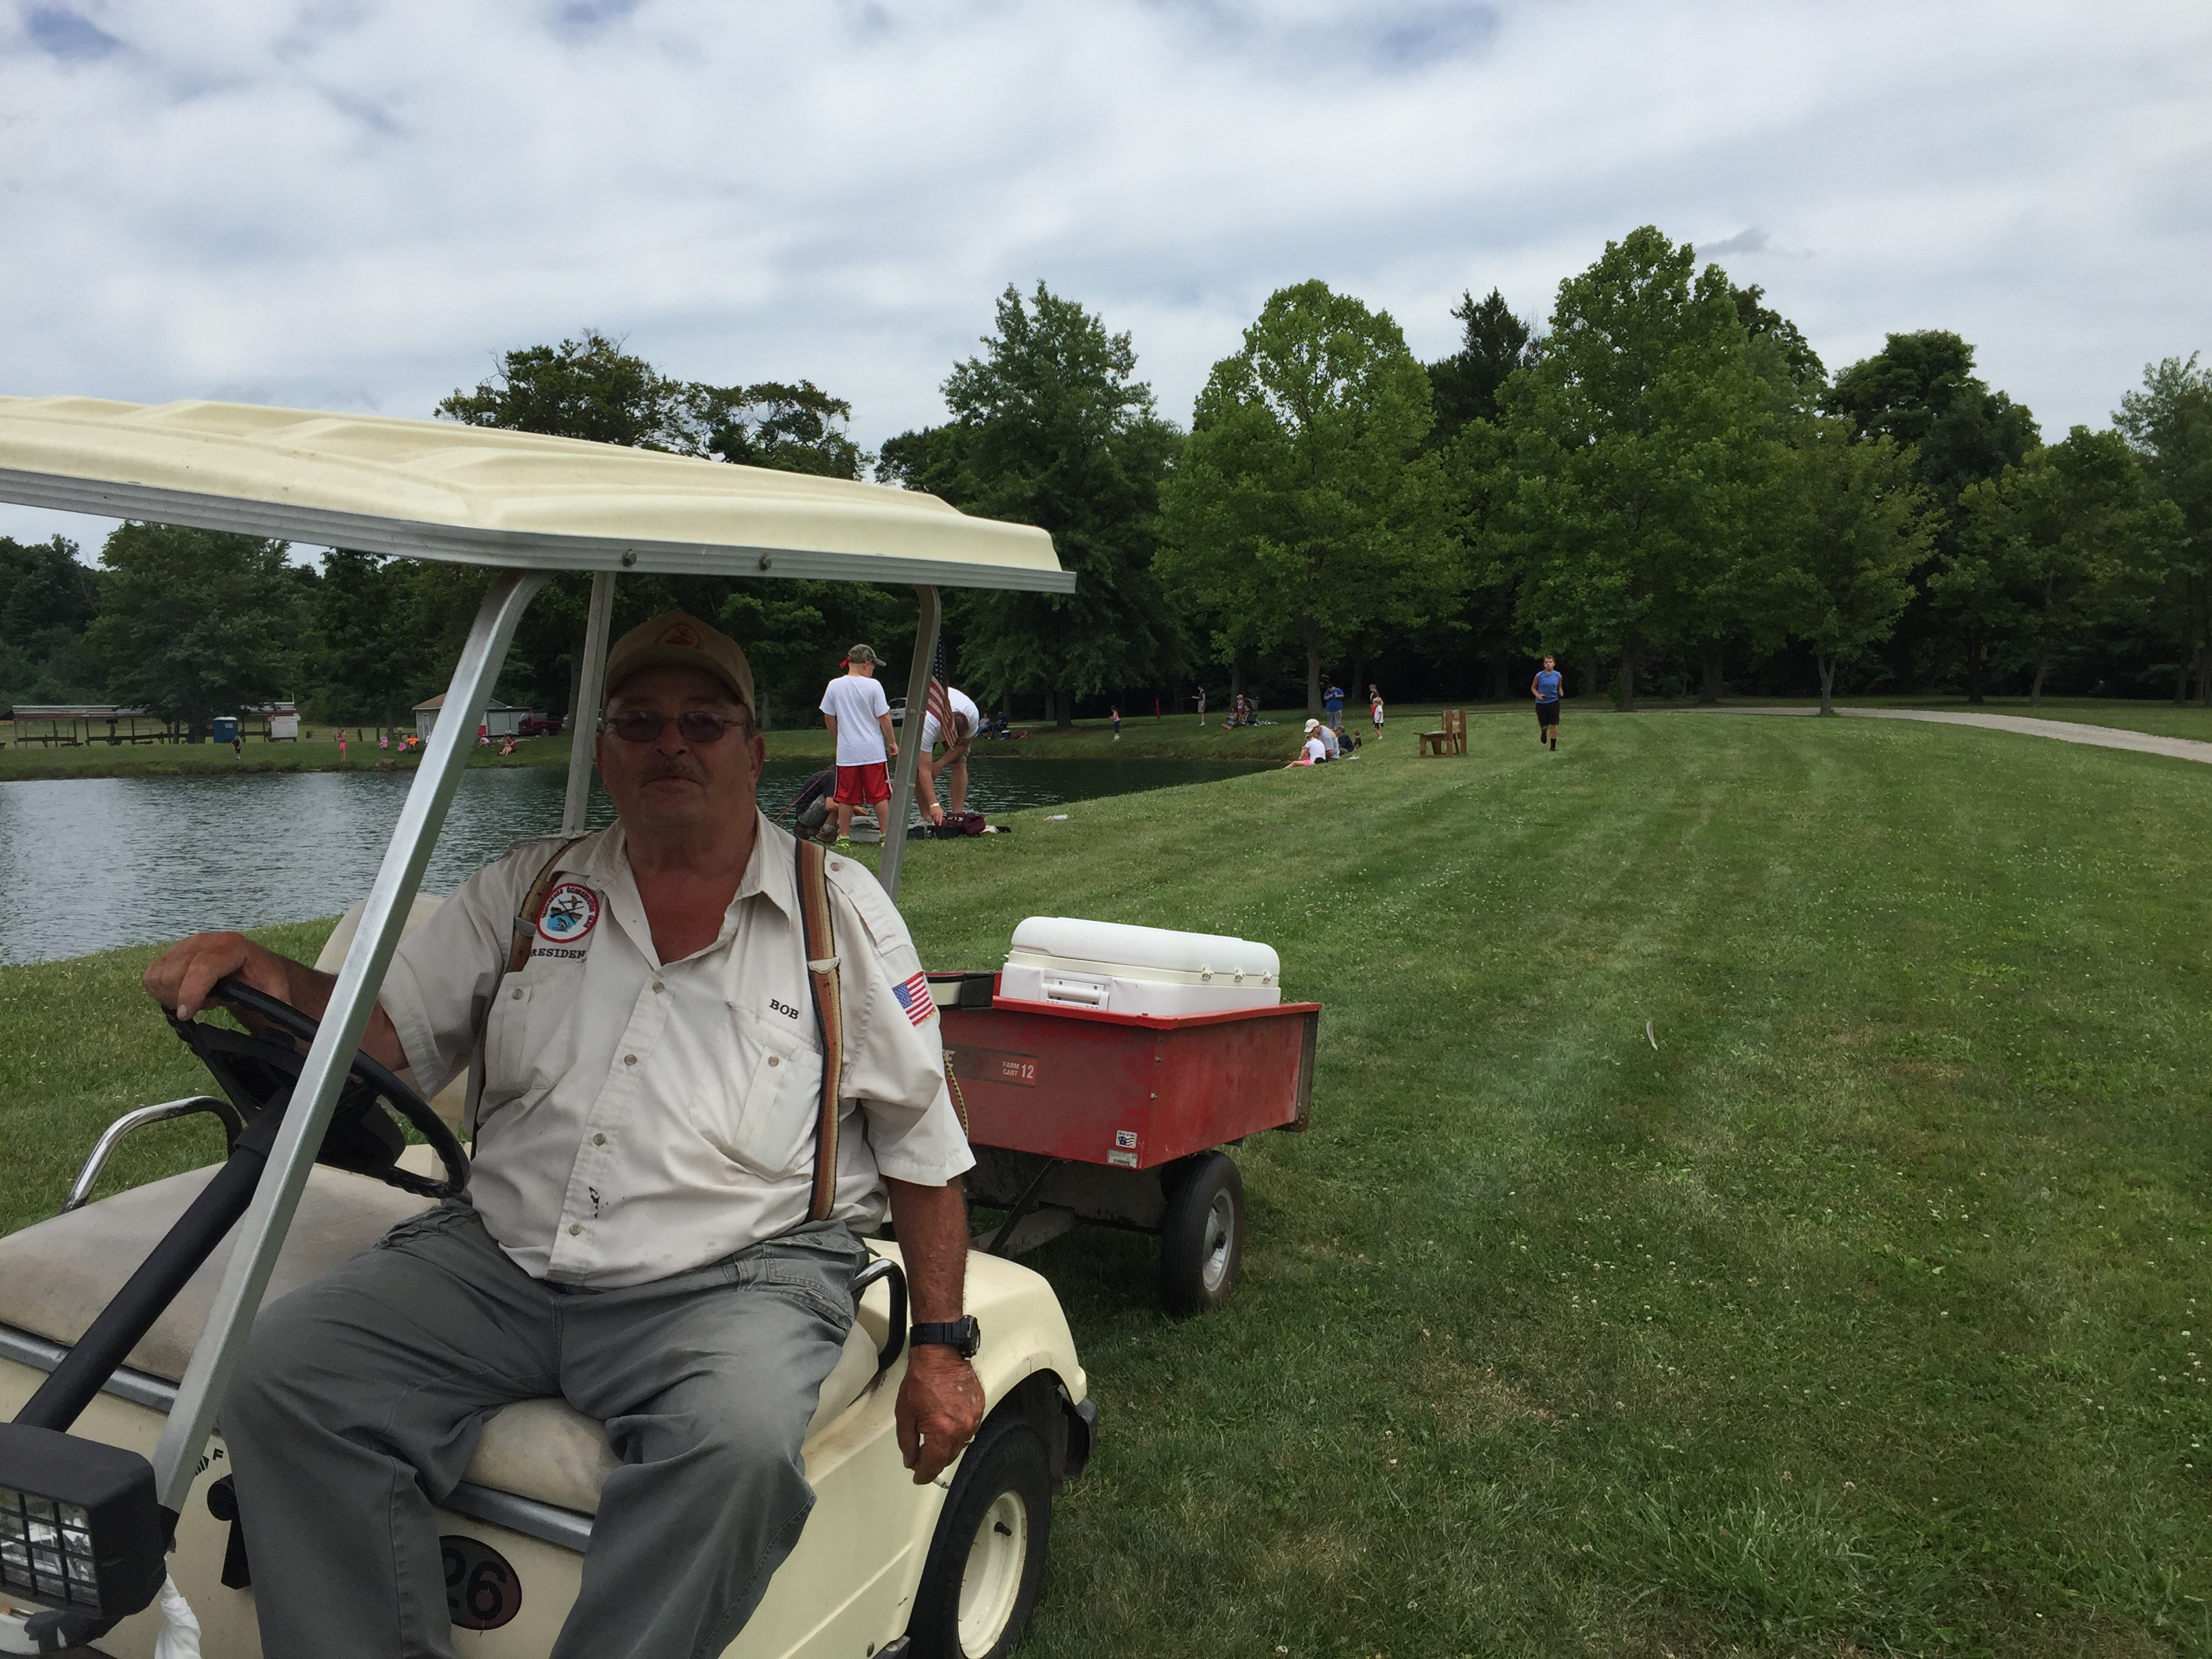 Bob golf cart